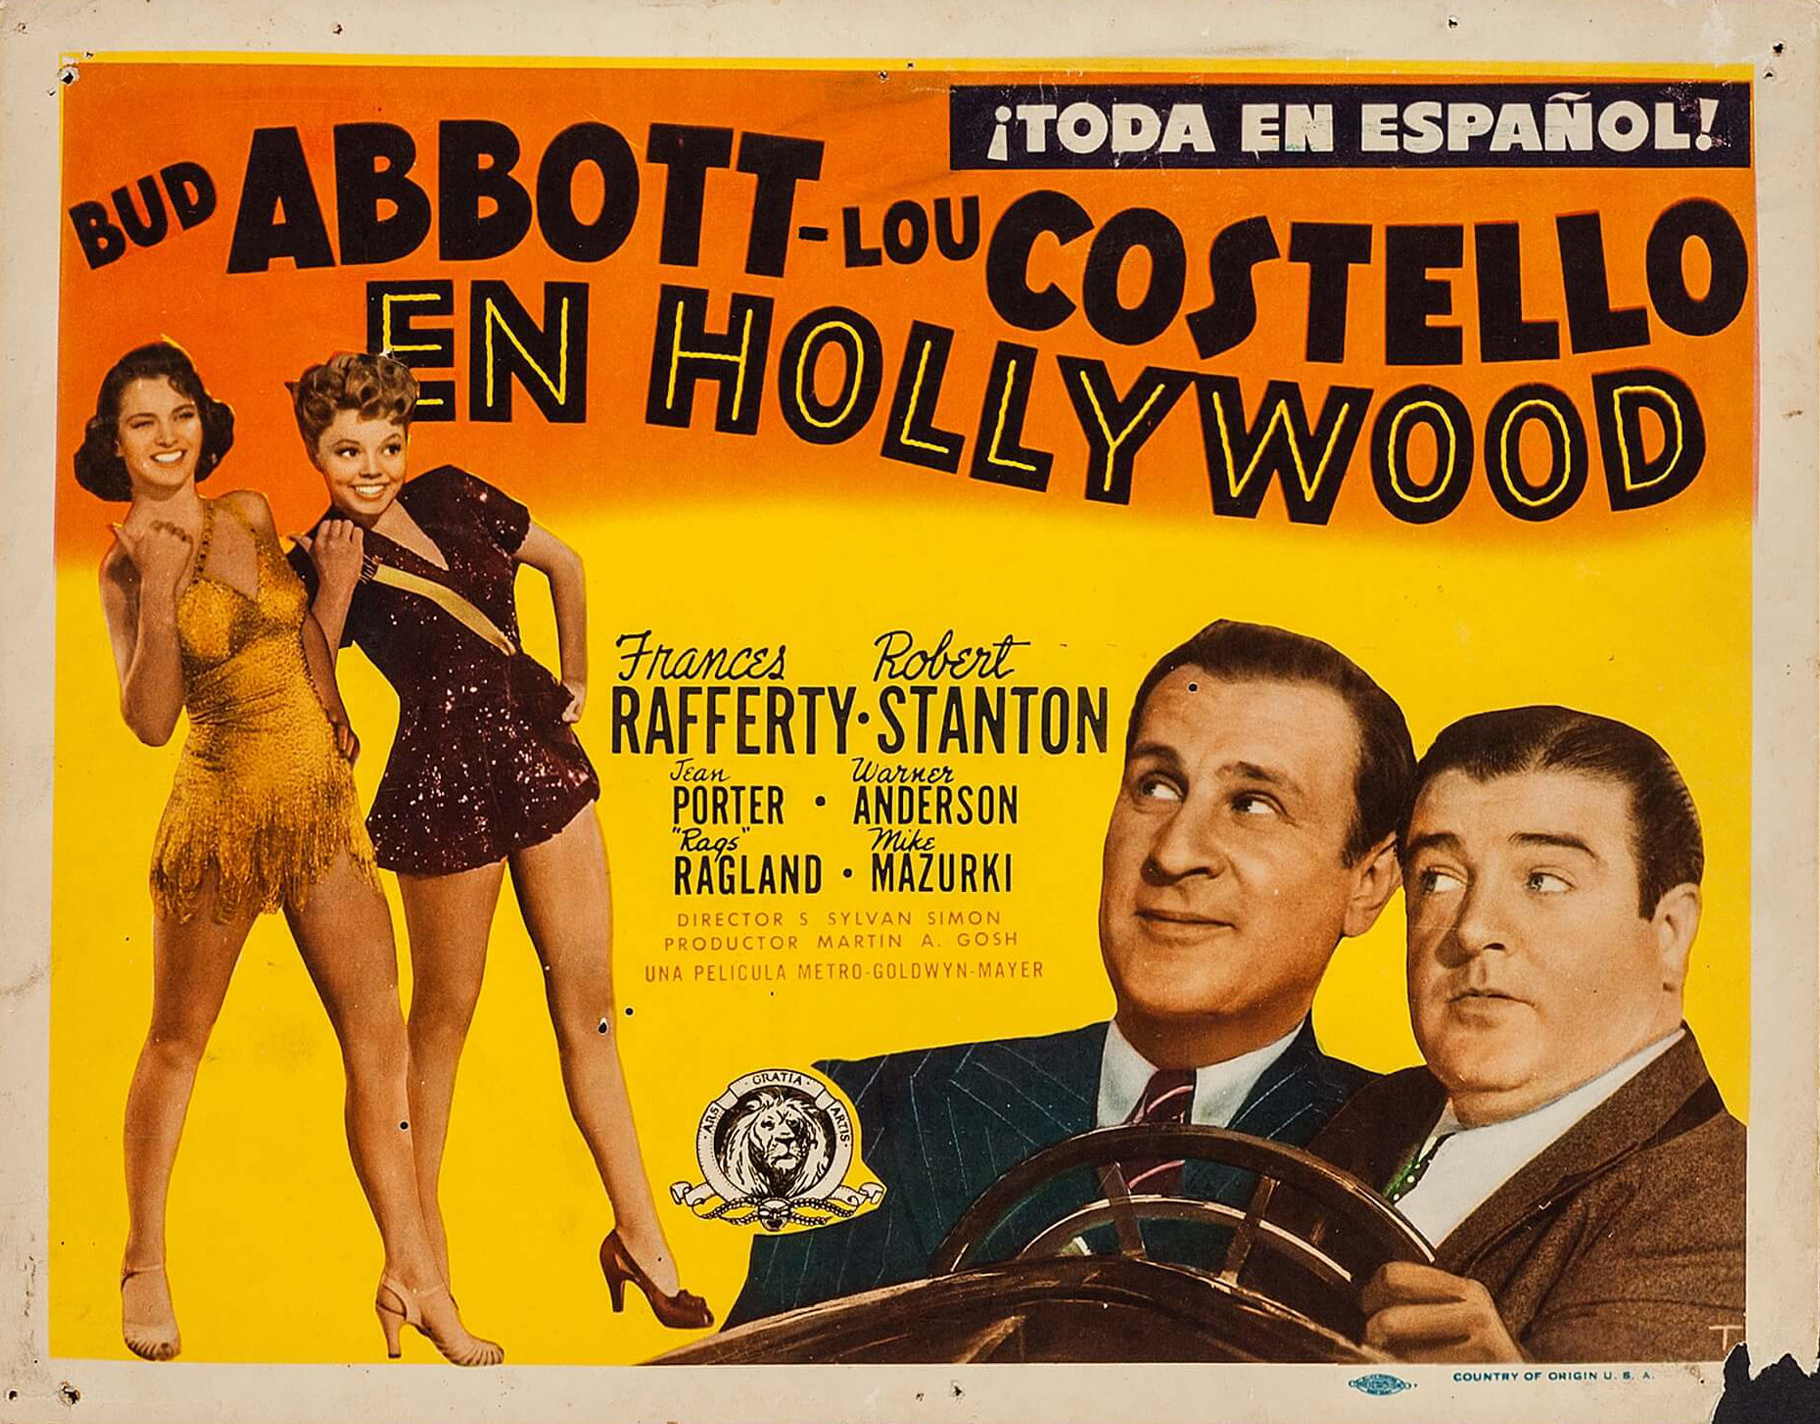 Abbott y Costello: En Hollywood